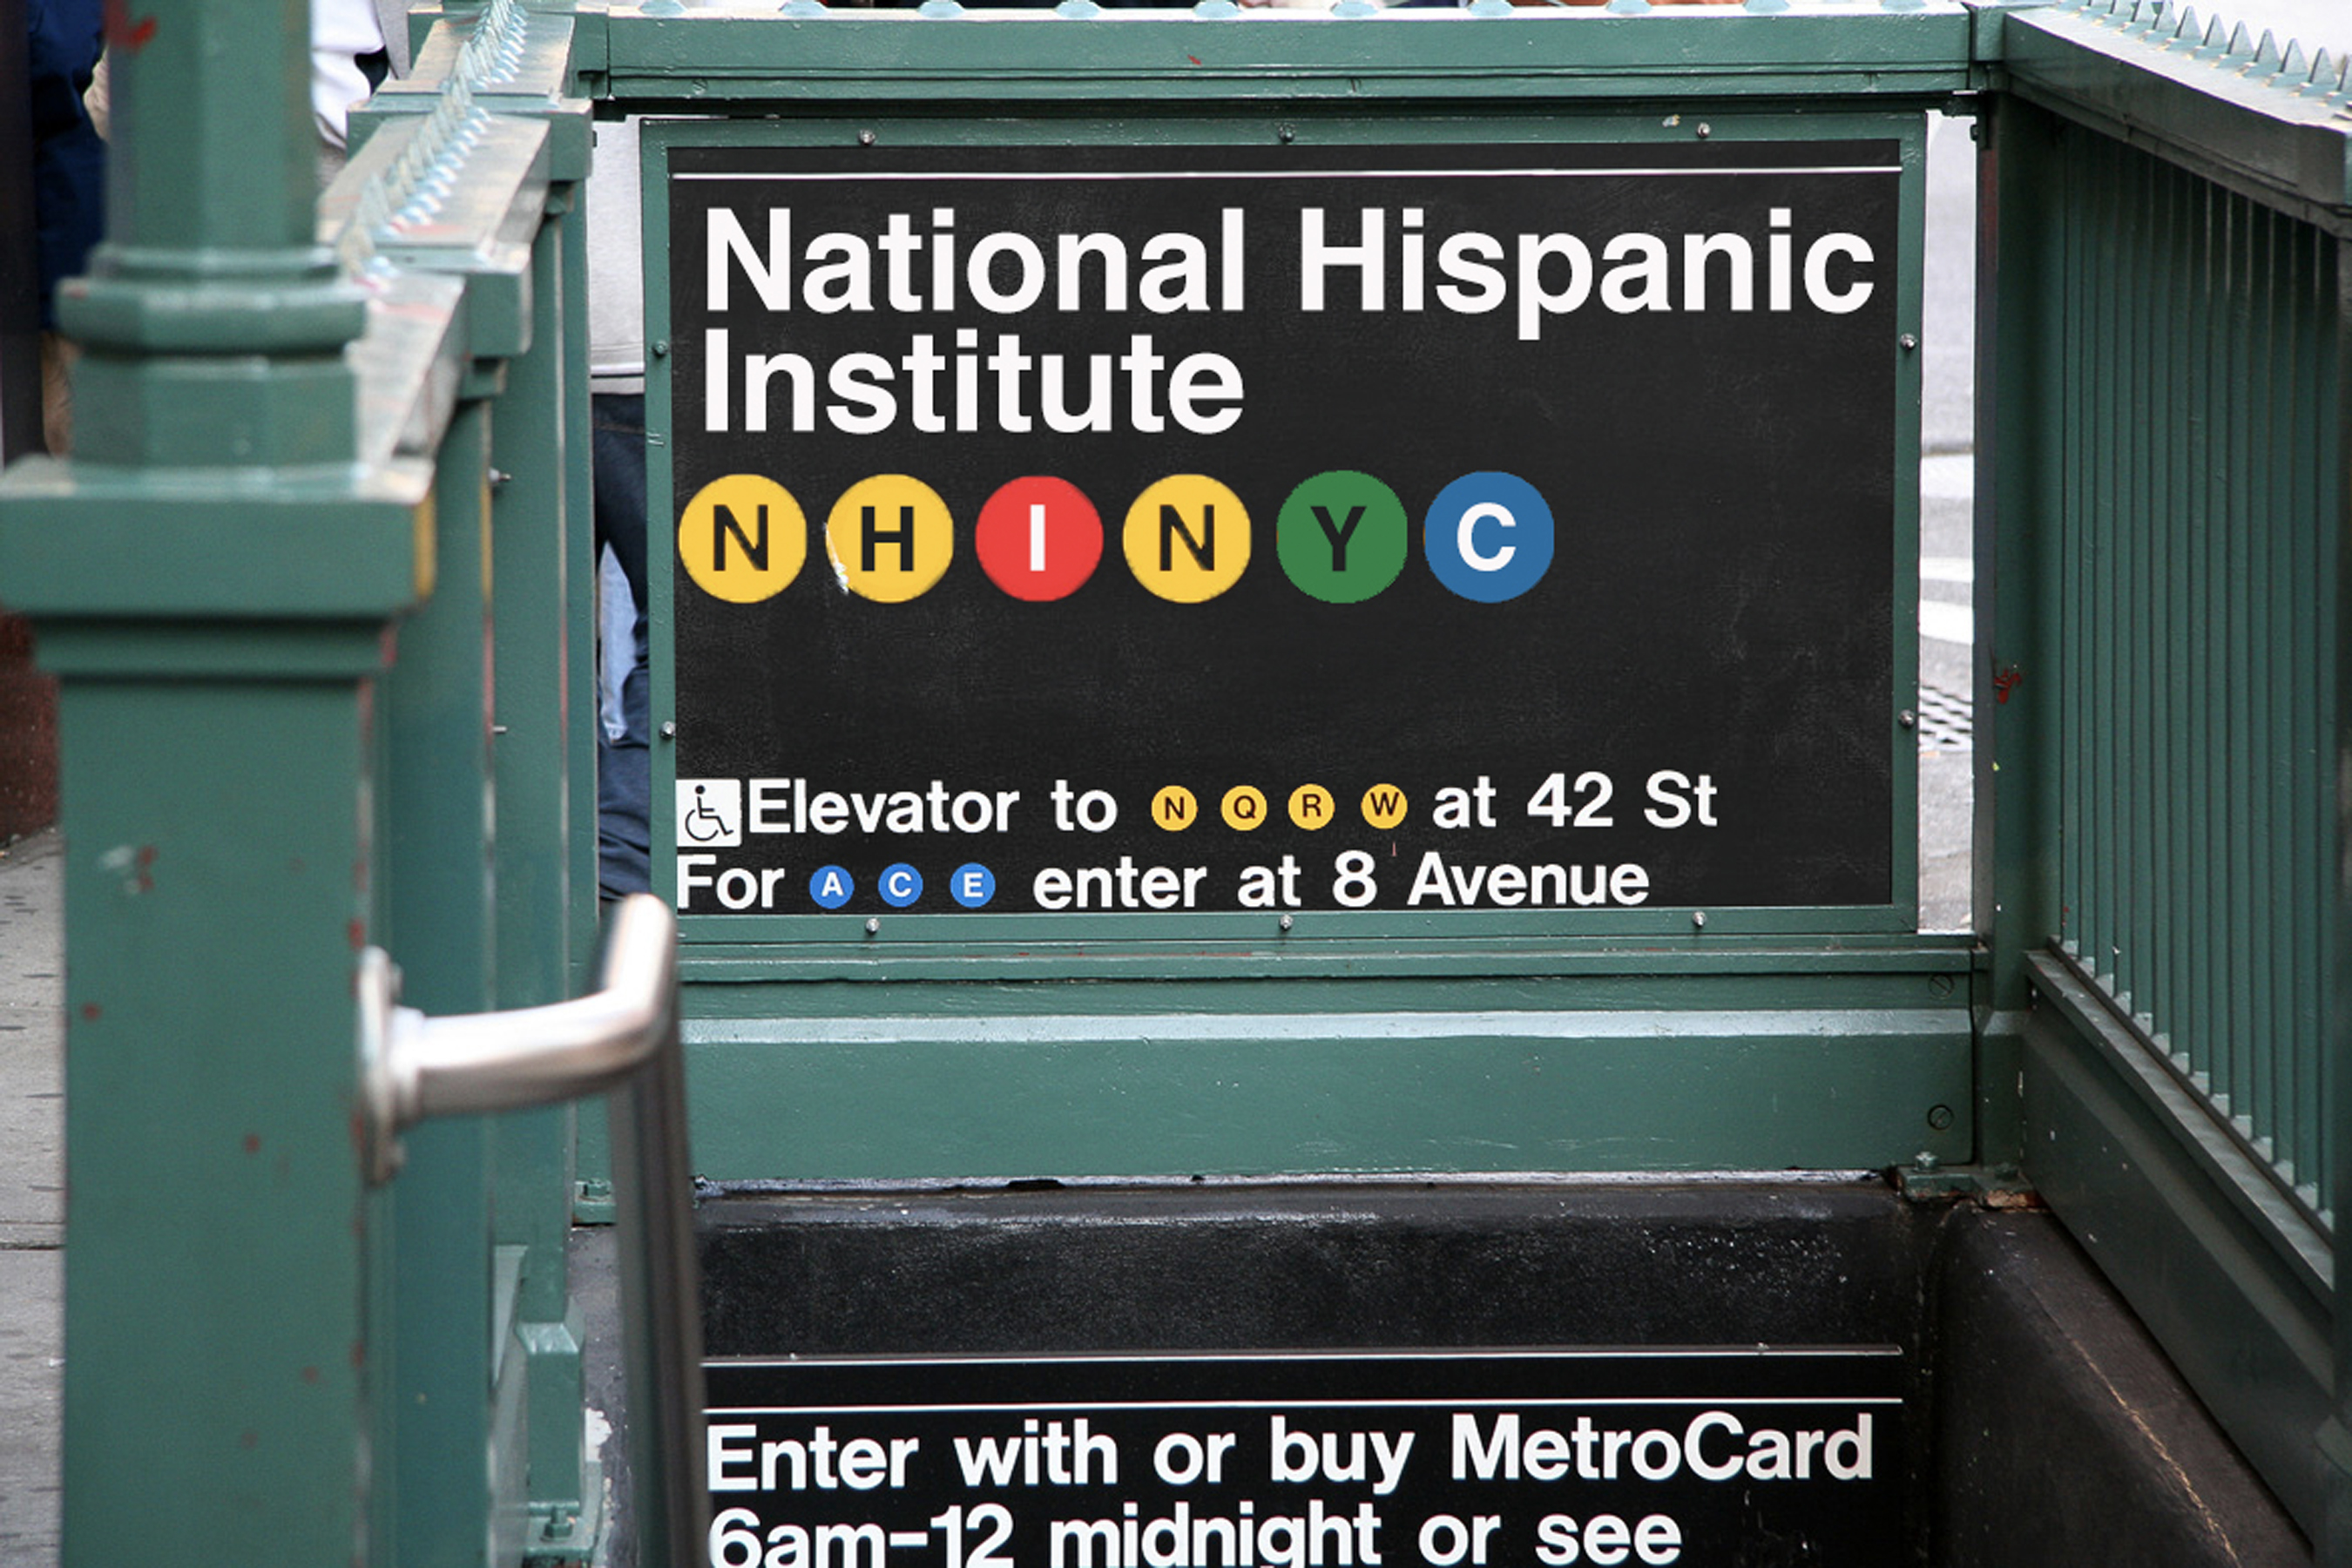 NHI in NYC